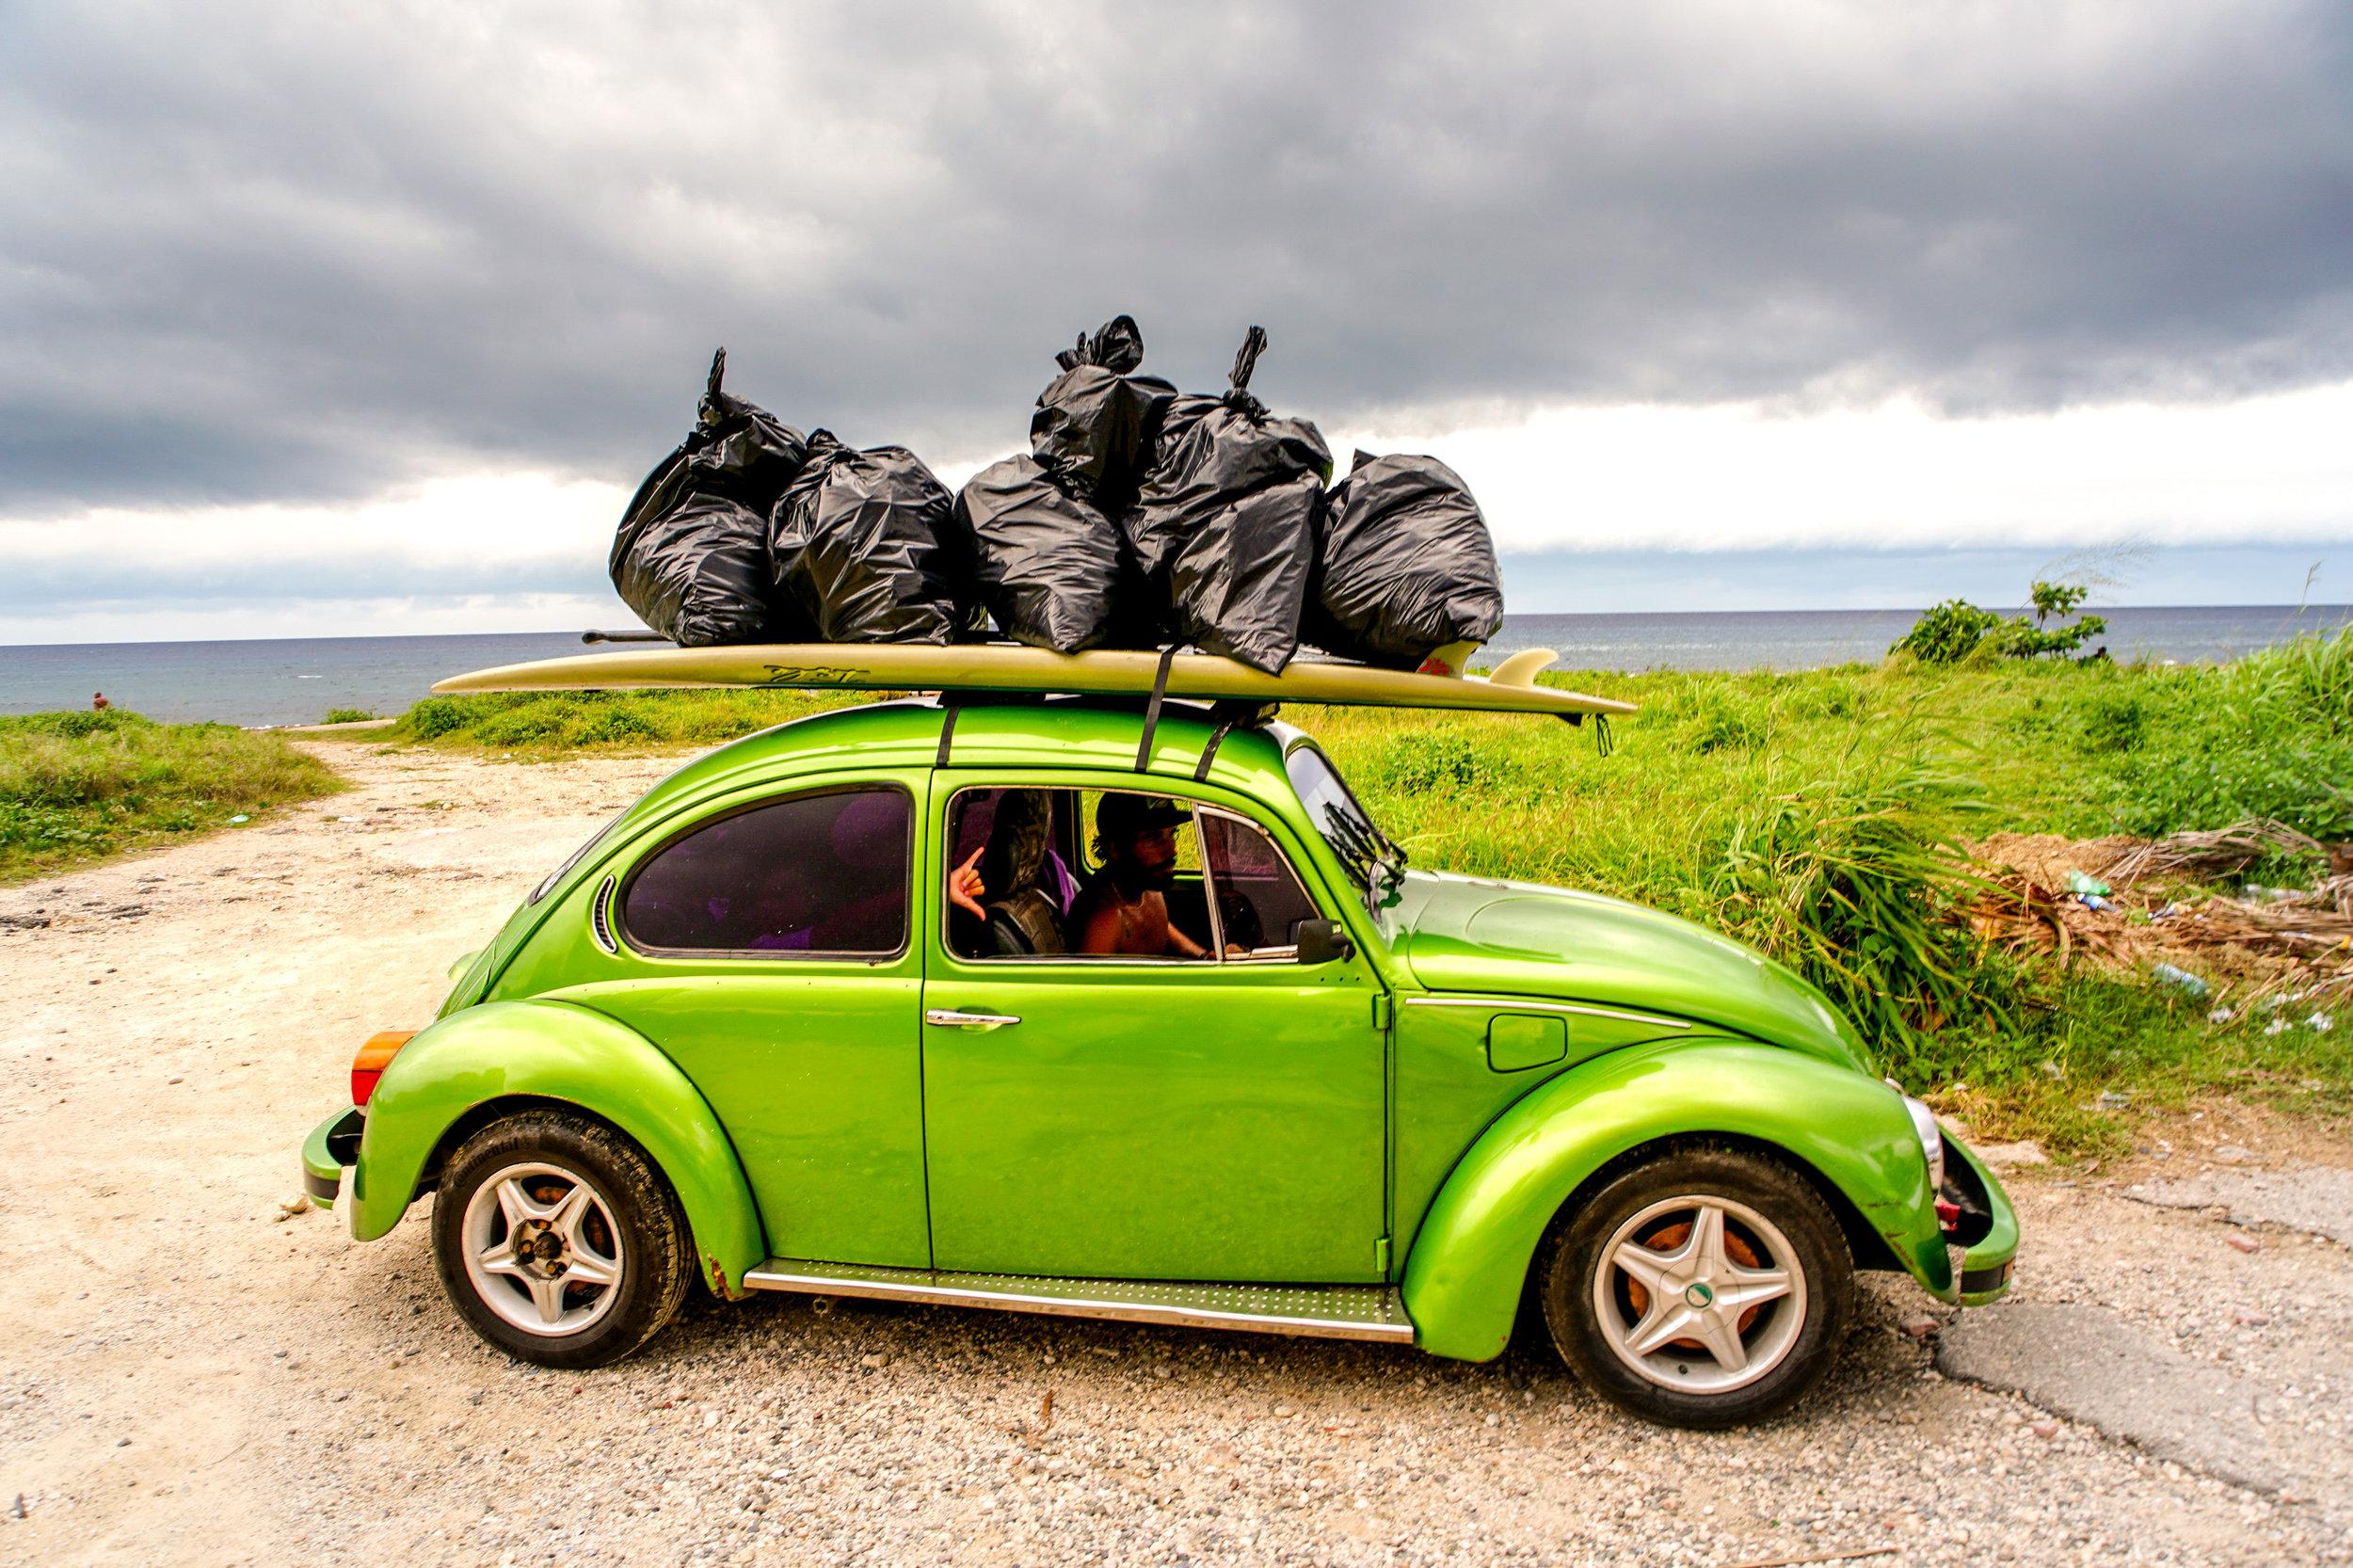 olapi-creative-cuba-trip-beach-cleanup